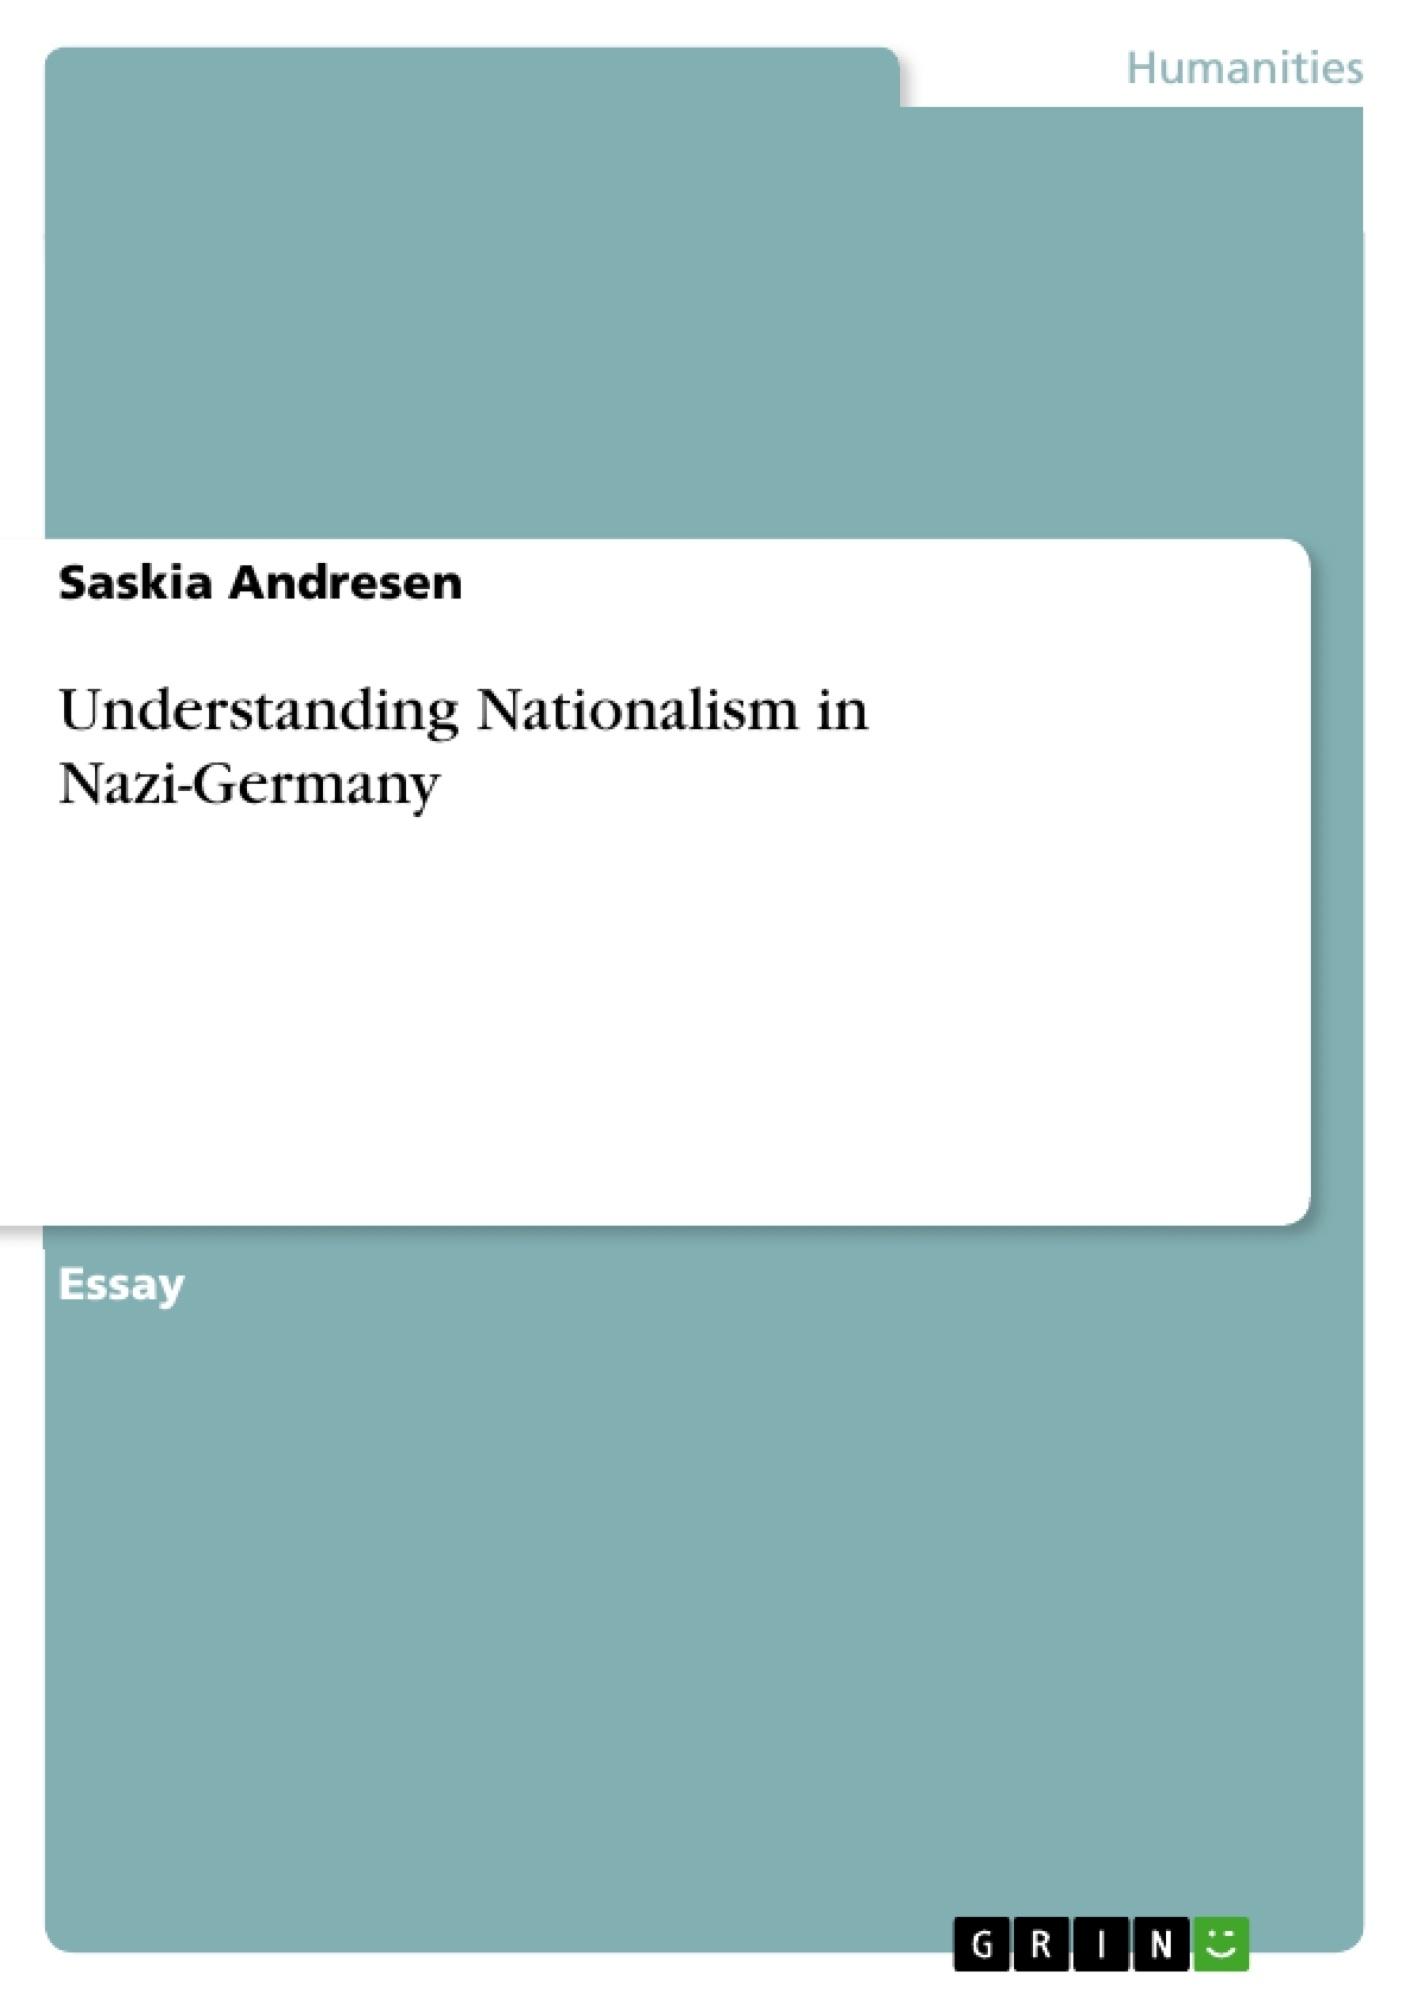 Title: Understanding Nationalism in Nazi-Germany